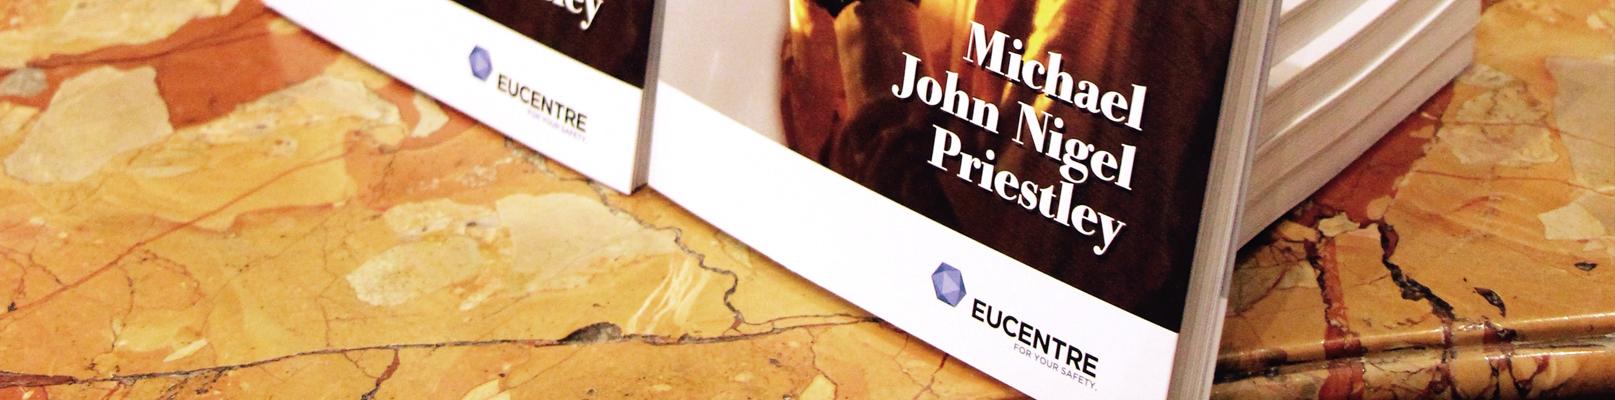 MJN-Priestley_3